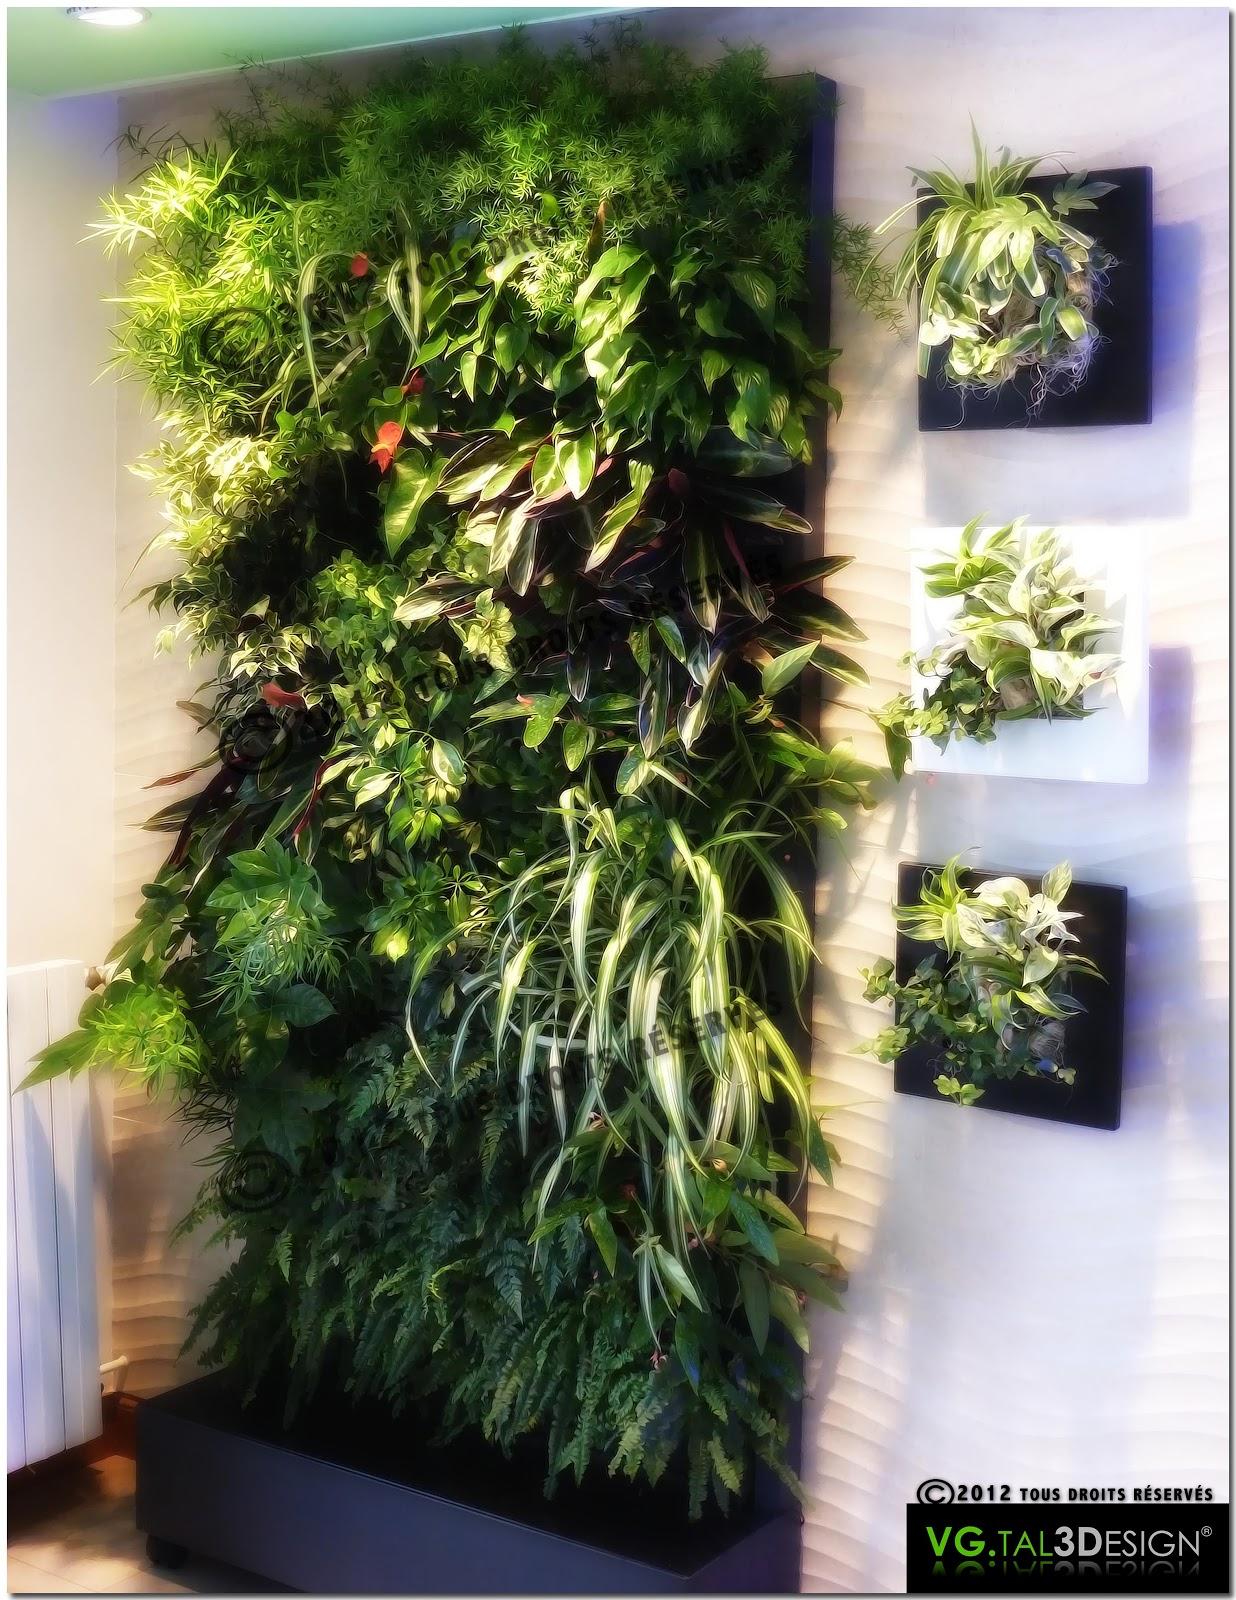 tableau vegetal ikea d co tableau vegetal ikea 98 marseille decodeur tnt prix decodeur tnt. Black Bedroom Furniture Sets. Home Design Ideas